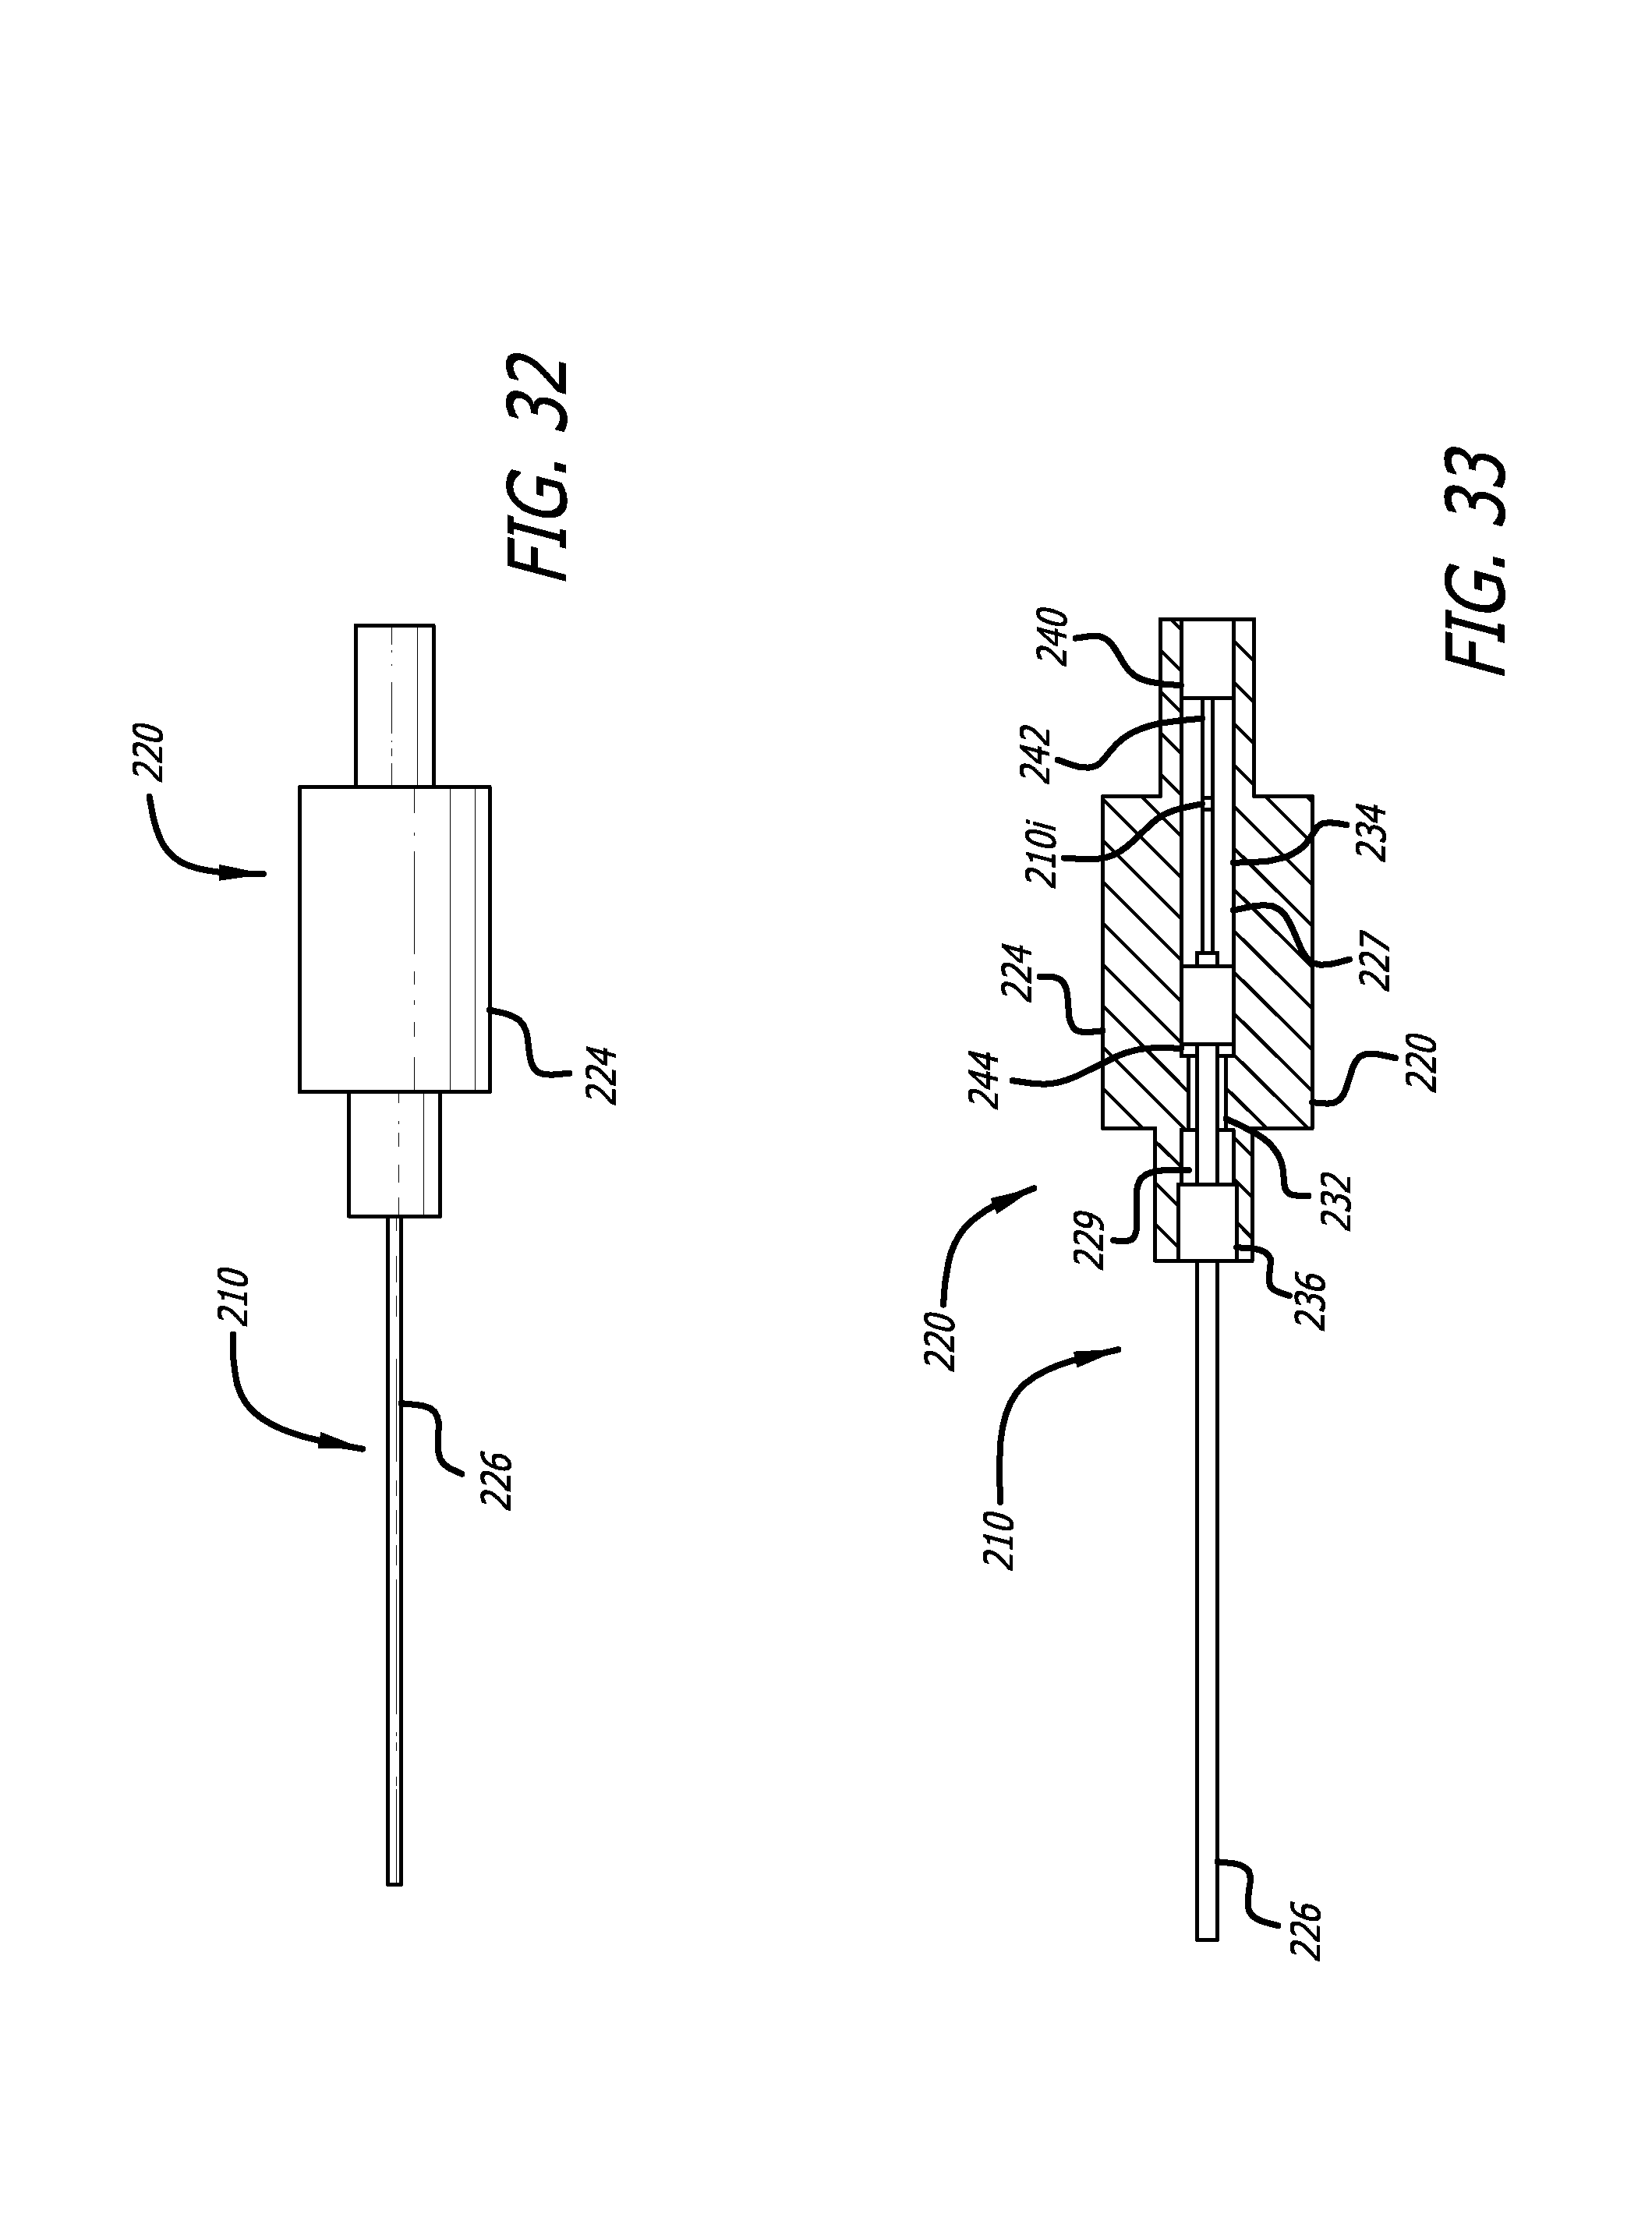 Patent US 9,820,688 B2